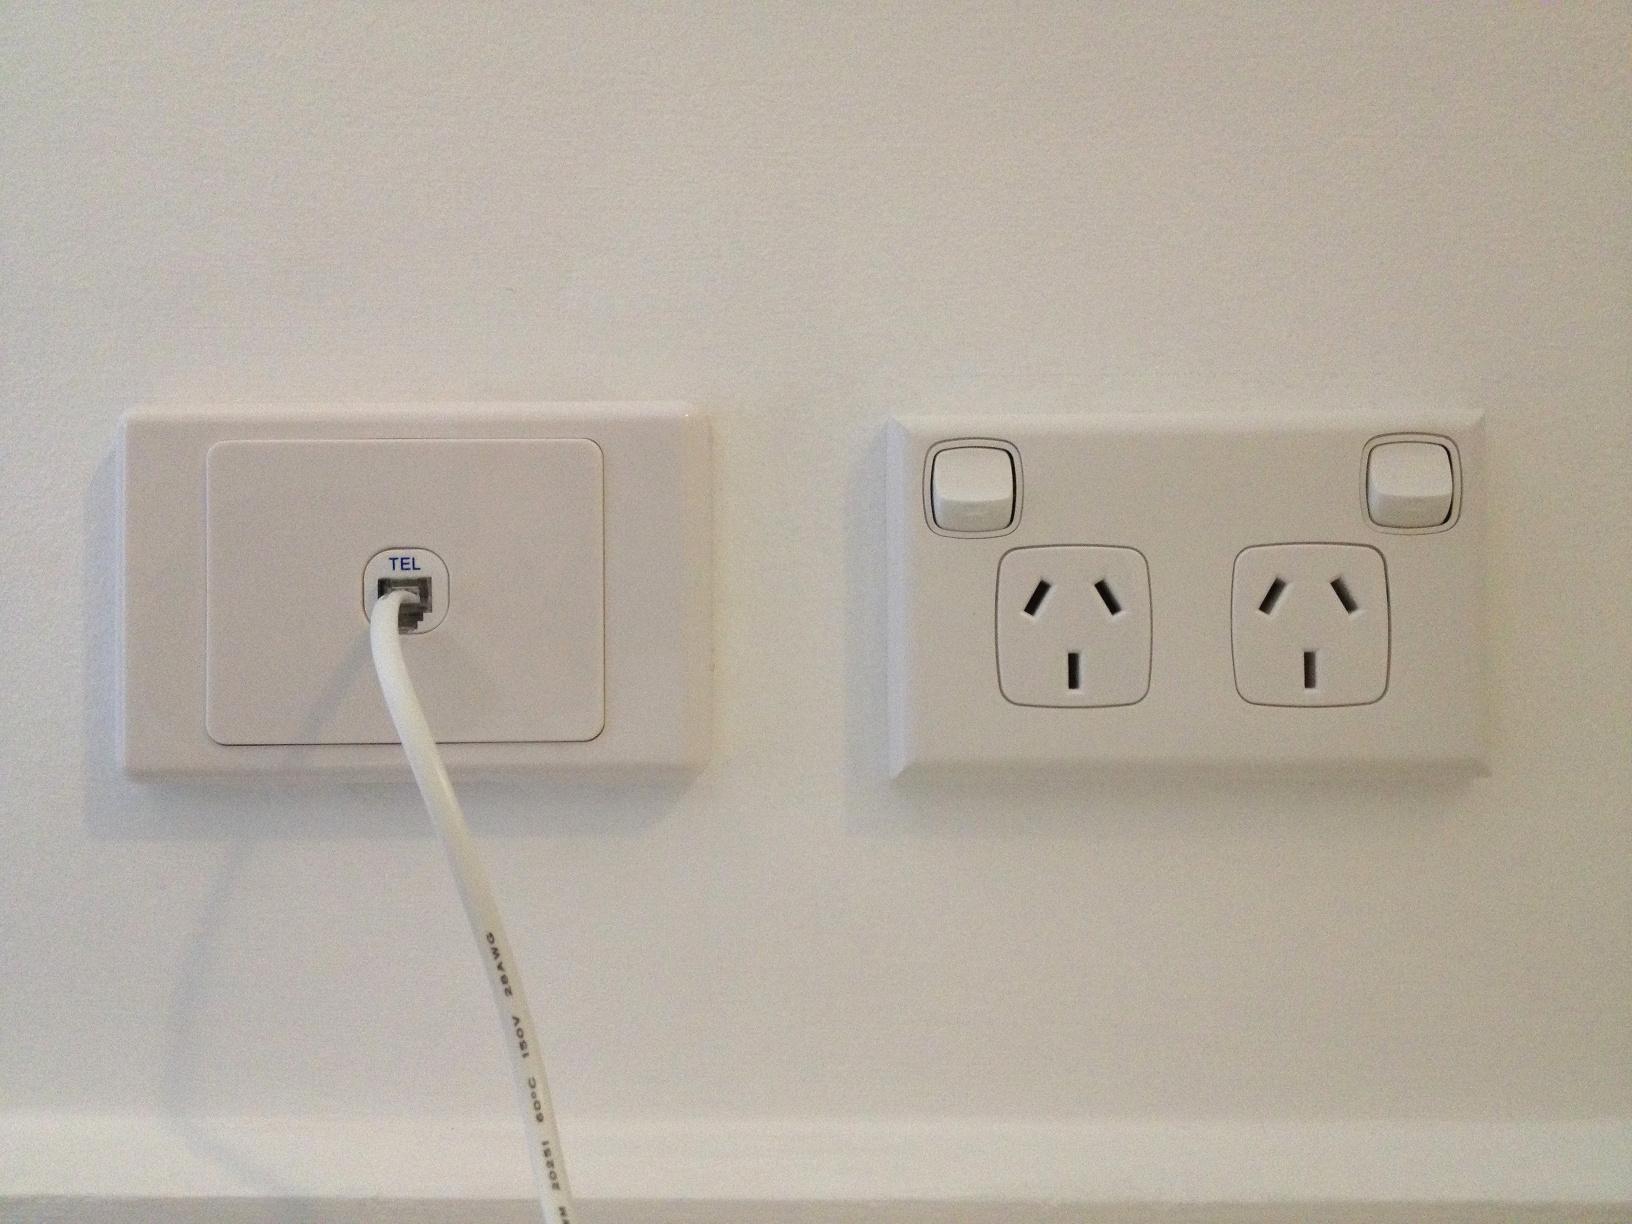 small resolution of wiring telephone plug australia wiring diagram today rj11 wall socket wiring diagram australia